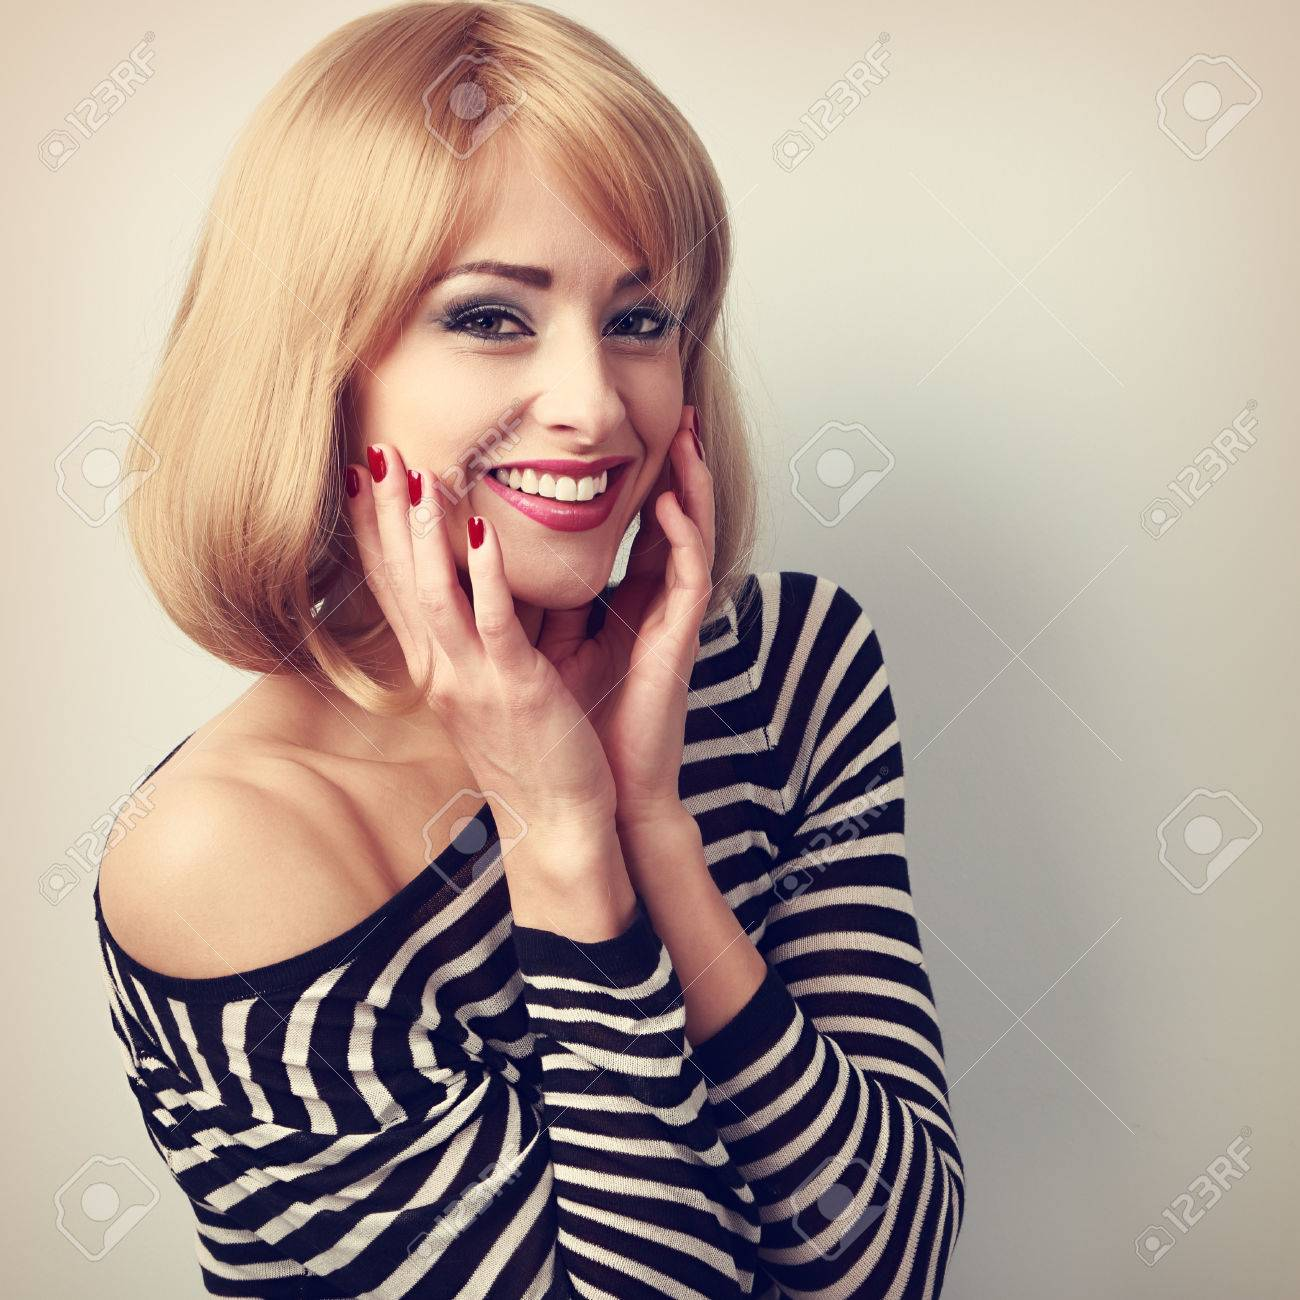 foto de archivo riendo mujer rubia con corte de pelo corto en la blusa de moda retrato de la vendimia